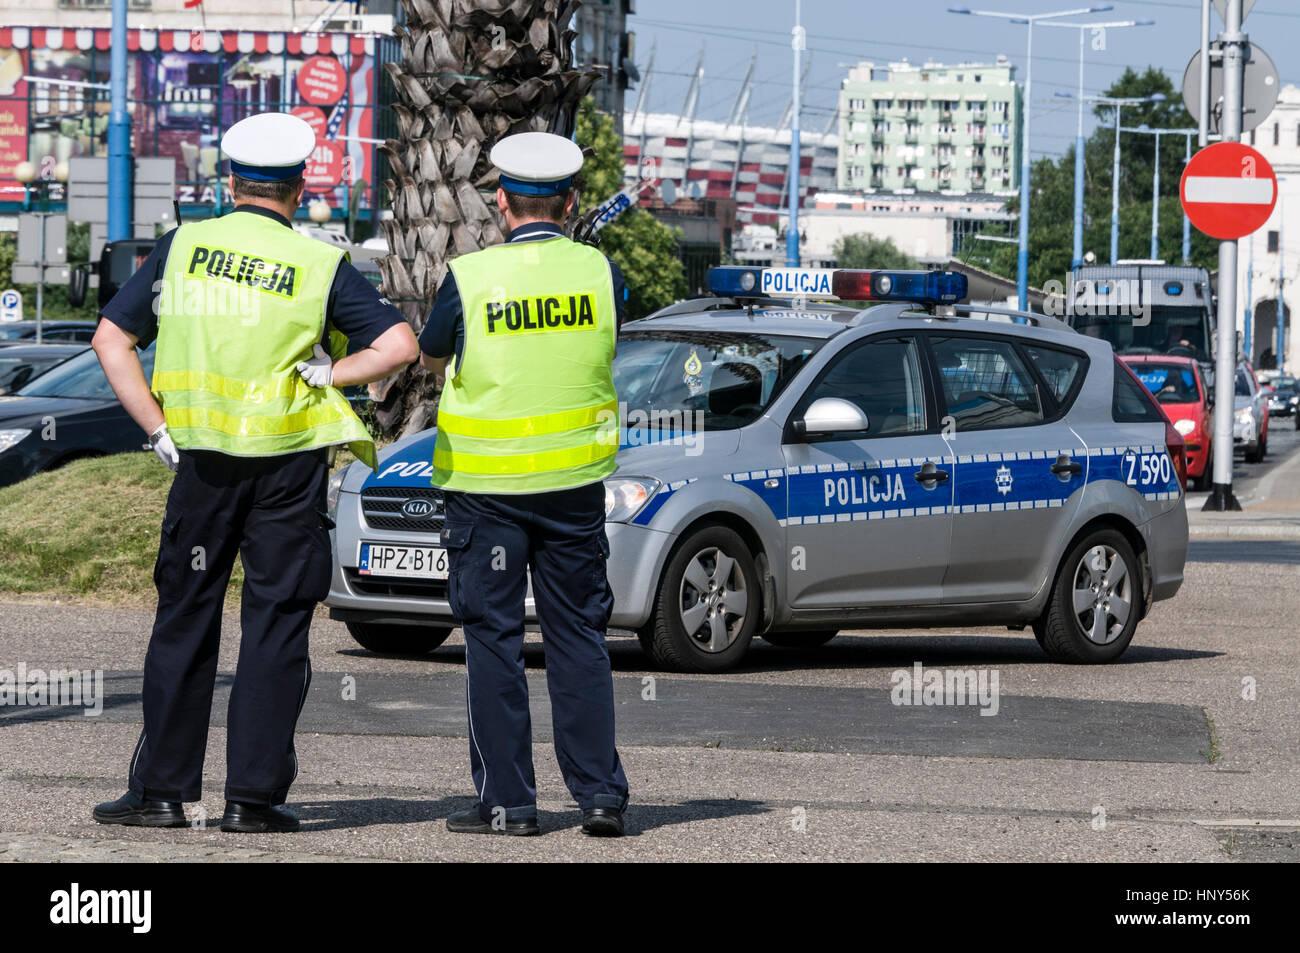 La Police de la ville de Varsovie sur l'obligation de circulation dans le centre de Varsovie en Pologne Photo Stock